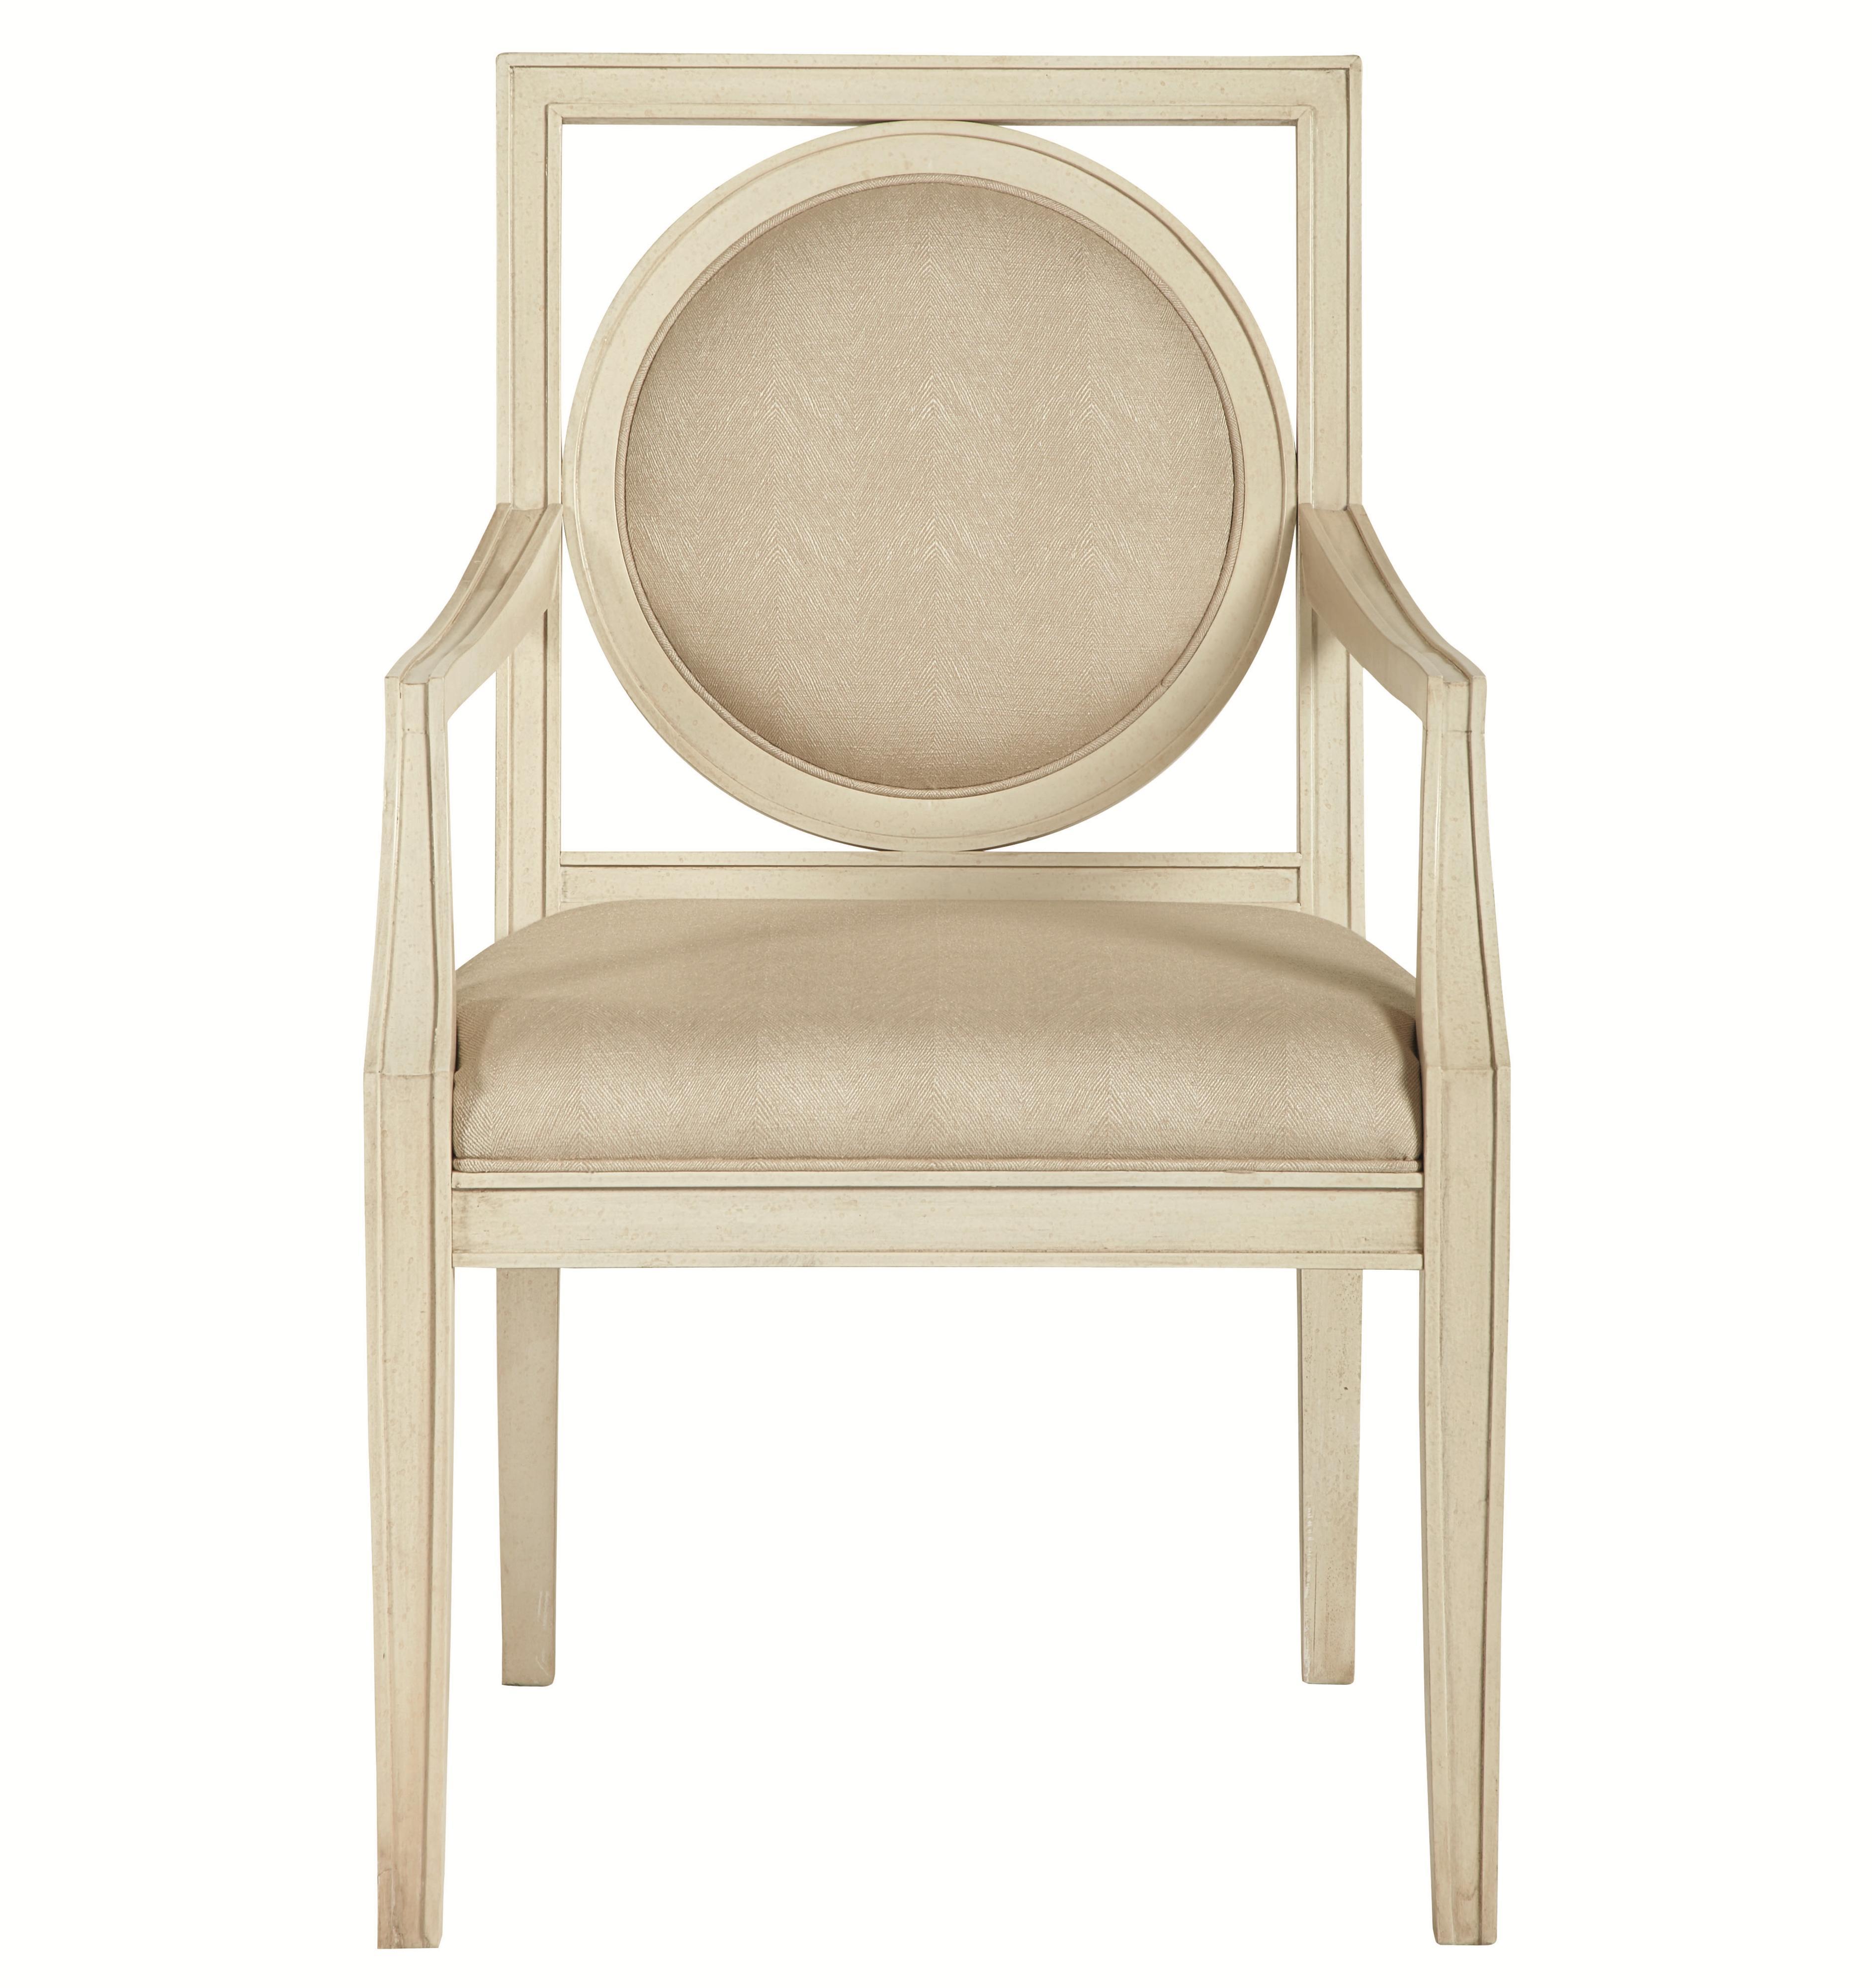 Salon Arm Chair at Williams & Kay